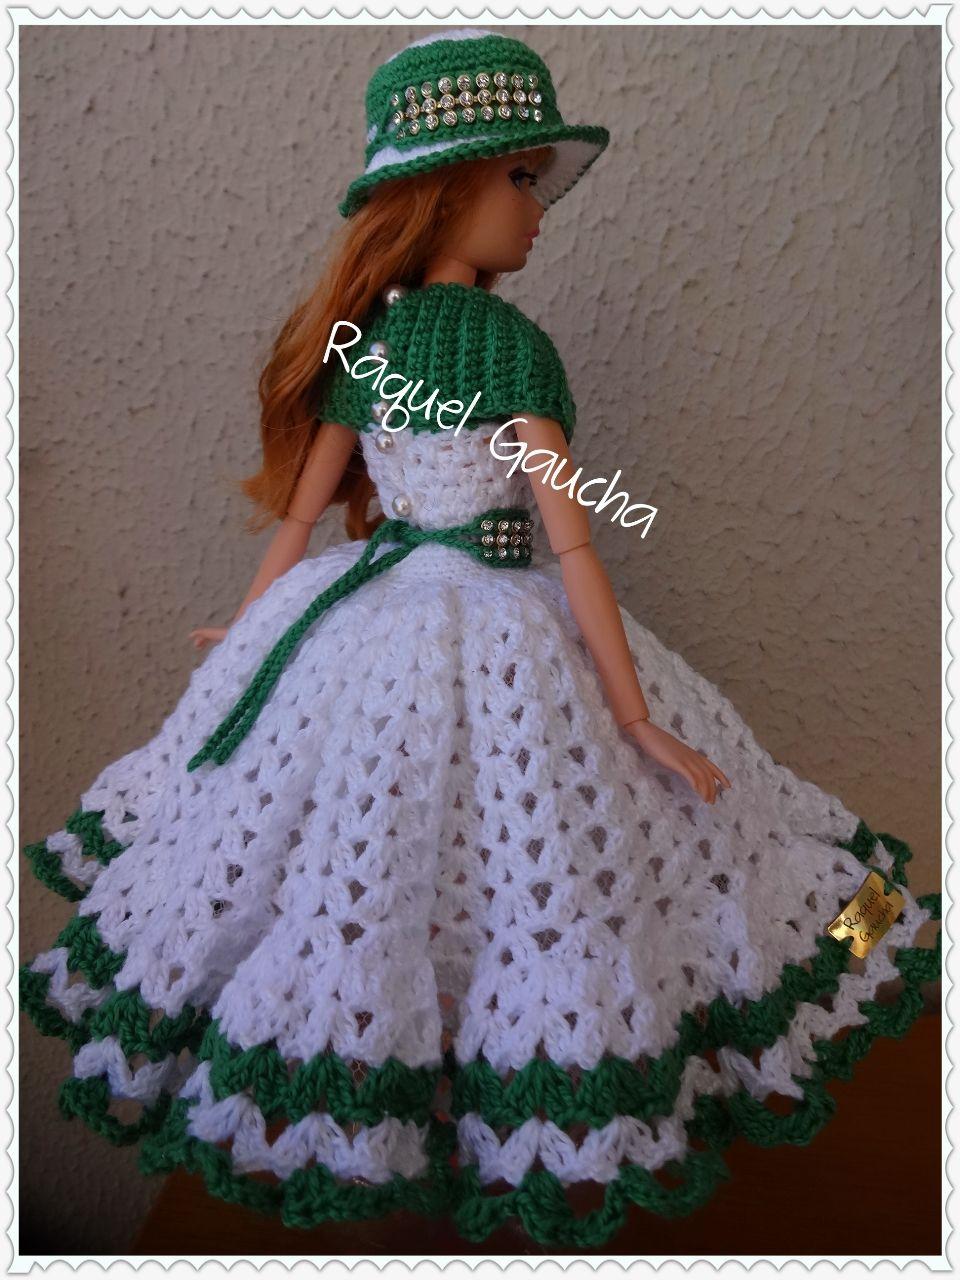 Cléa5 #Barbie #Doll #Crochet #Muñeca #Dress #Vestido #Sombrero ...